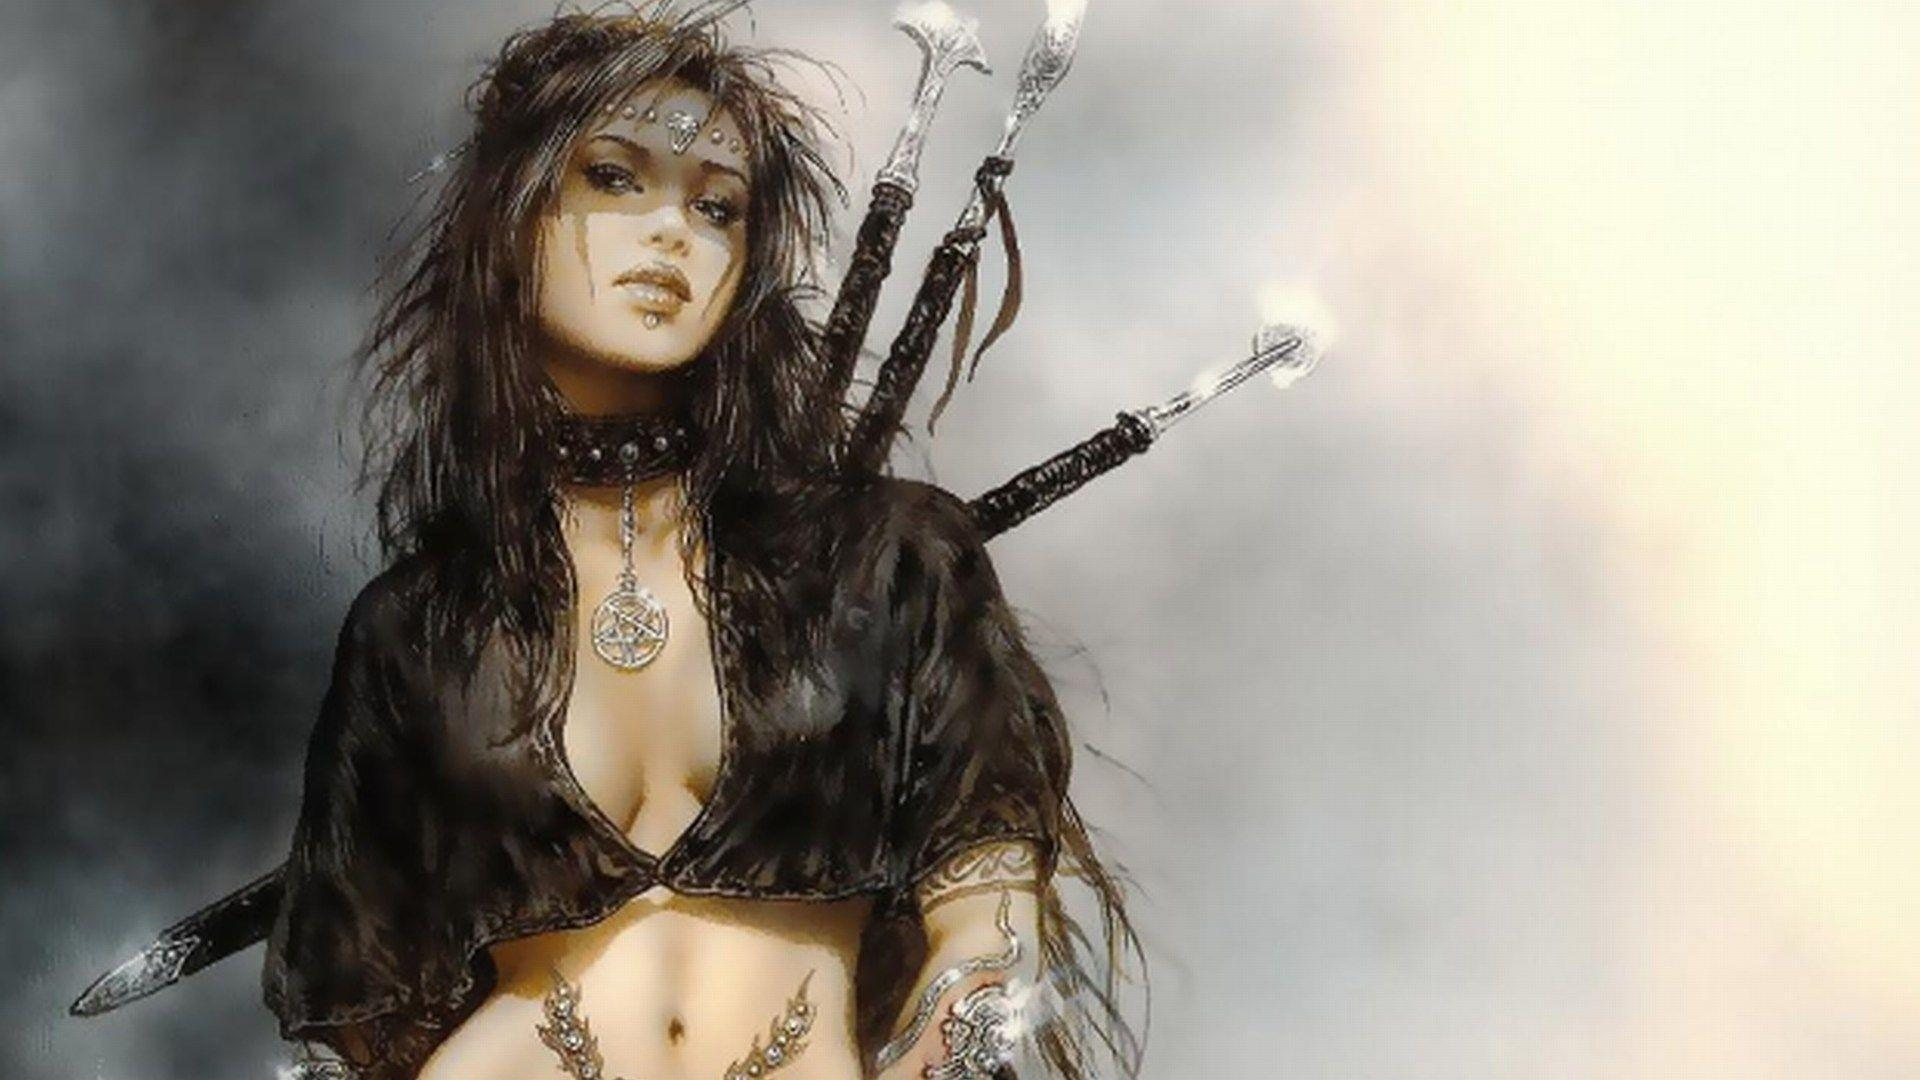 Luis royo wallpapers wallpaper cave - Fantasy female warrior artwork ...